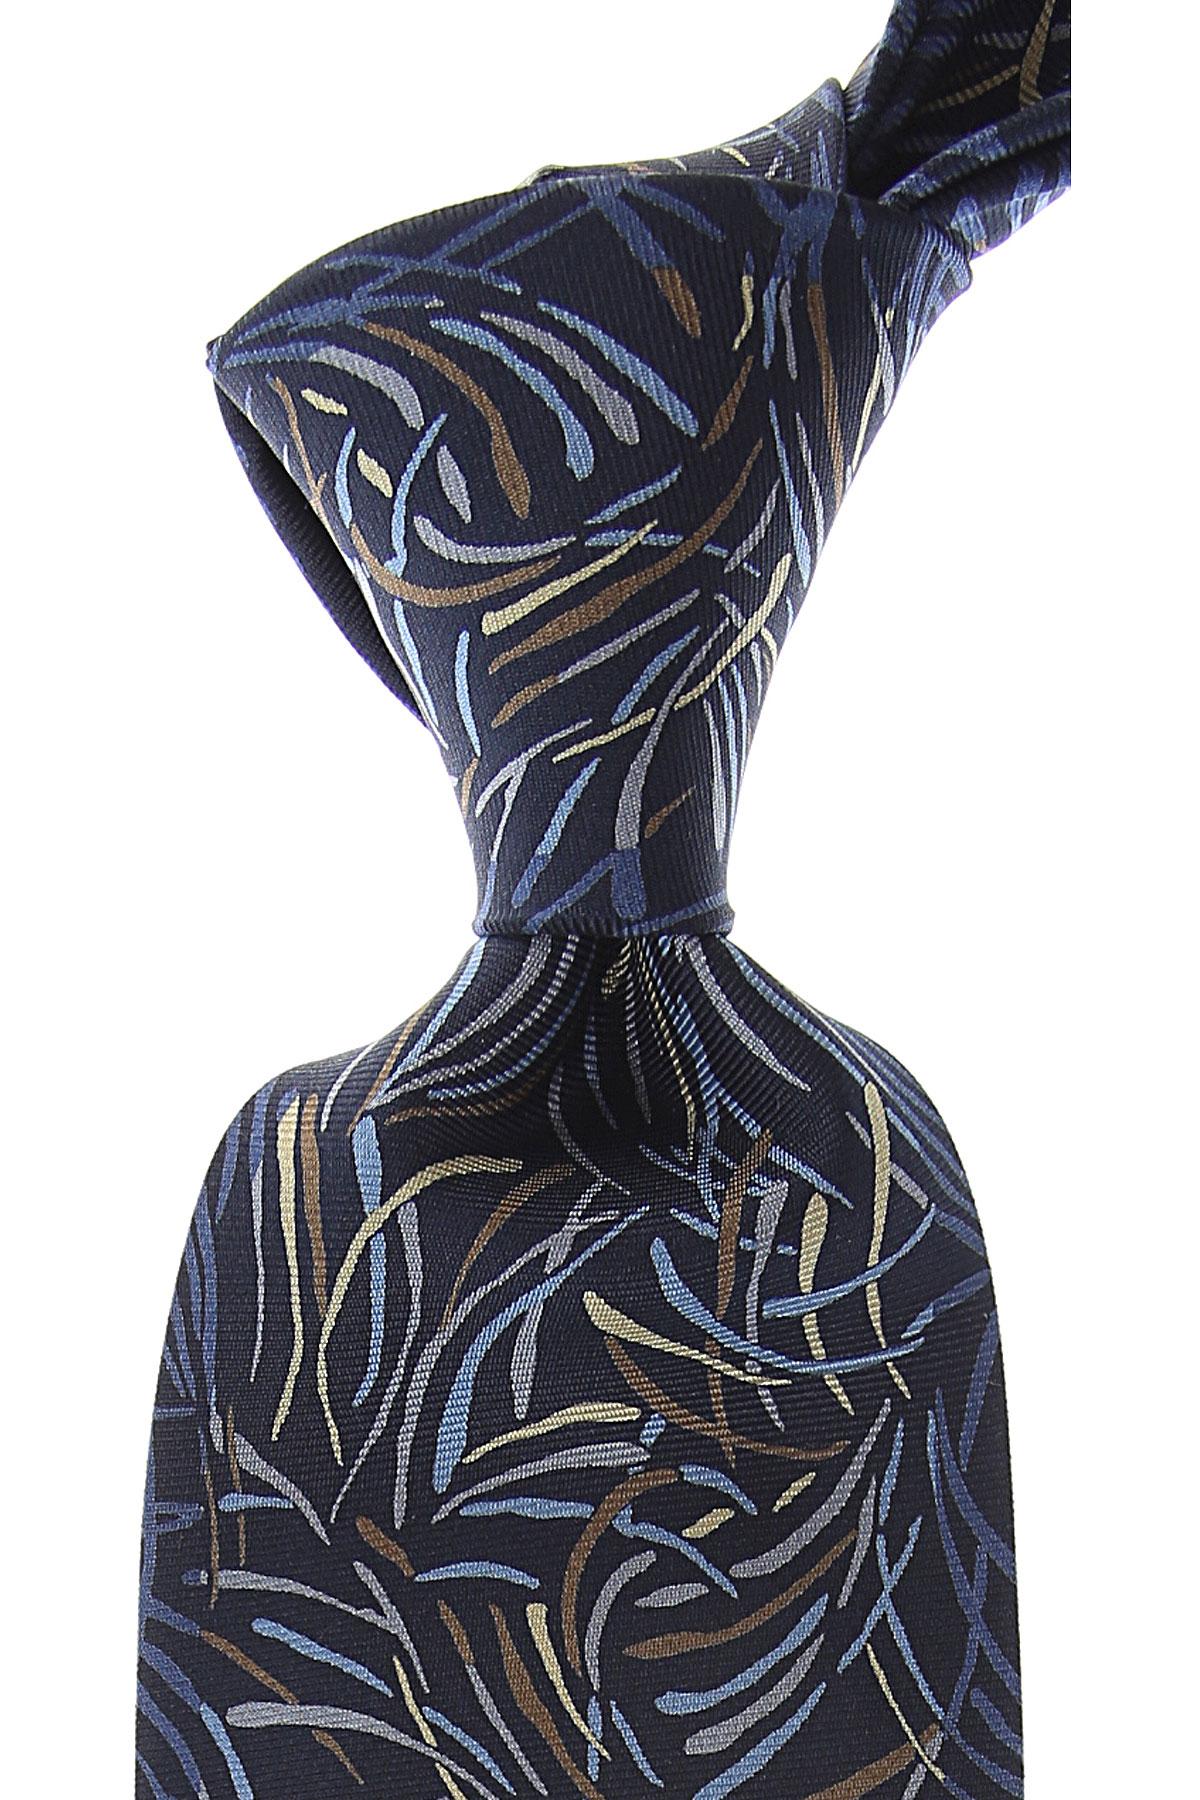 Mila Schon Ties On Sale, Dark Blue Navy, Silk, 2019